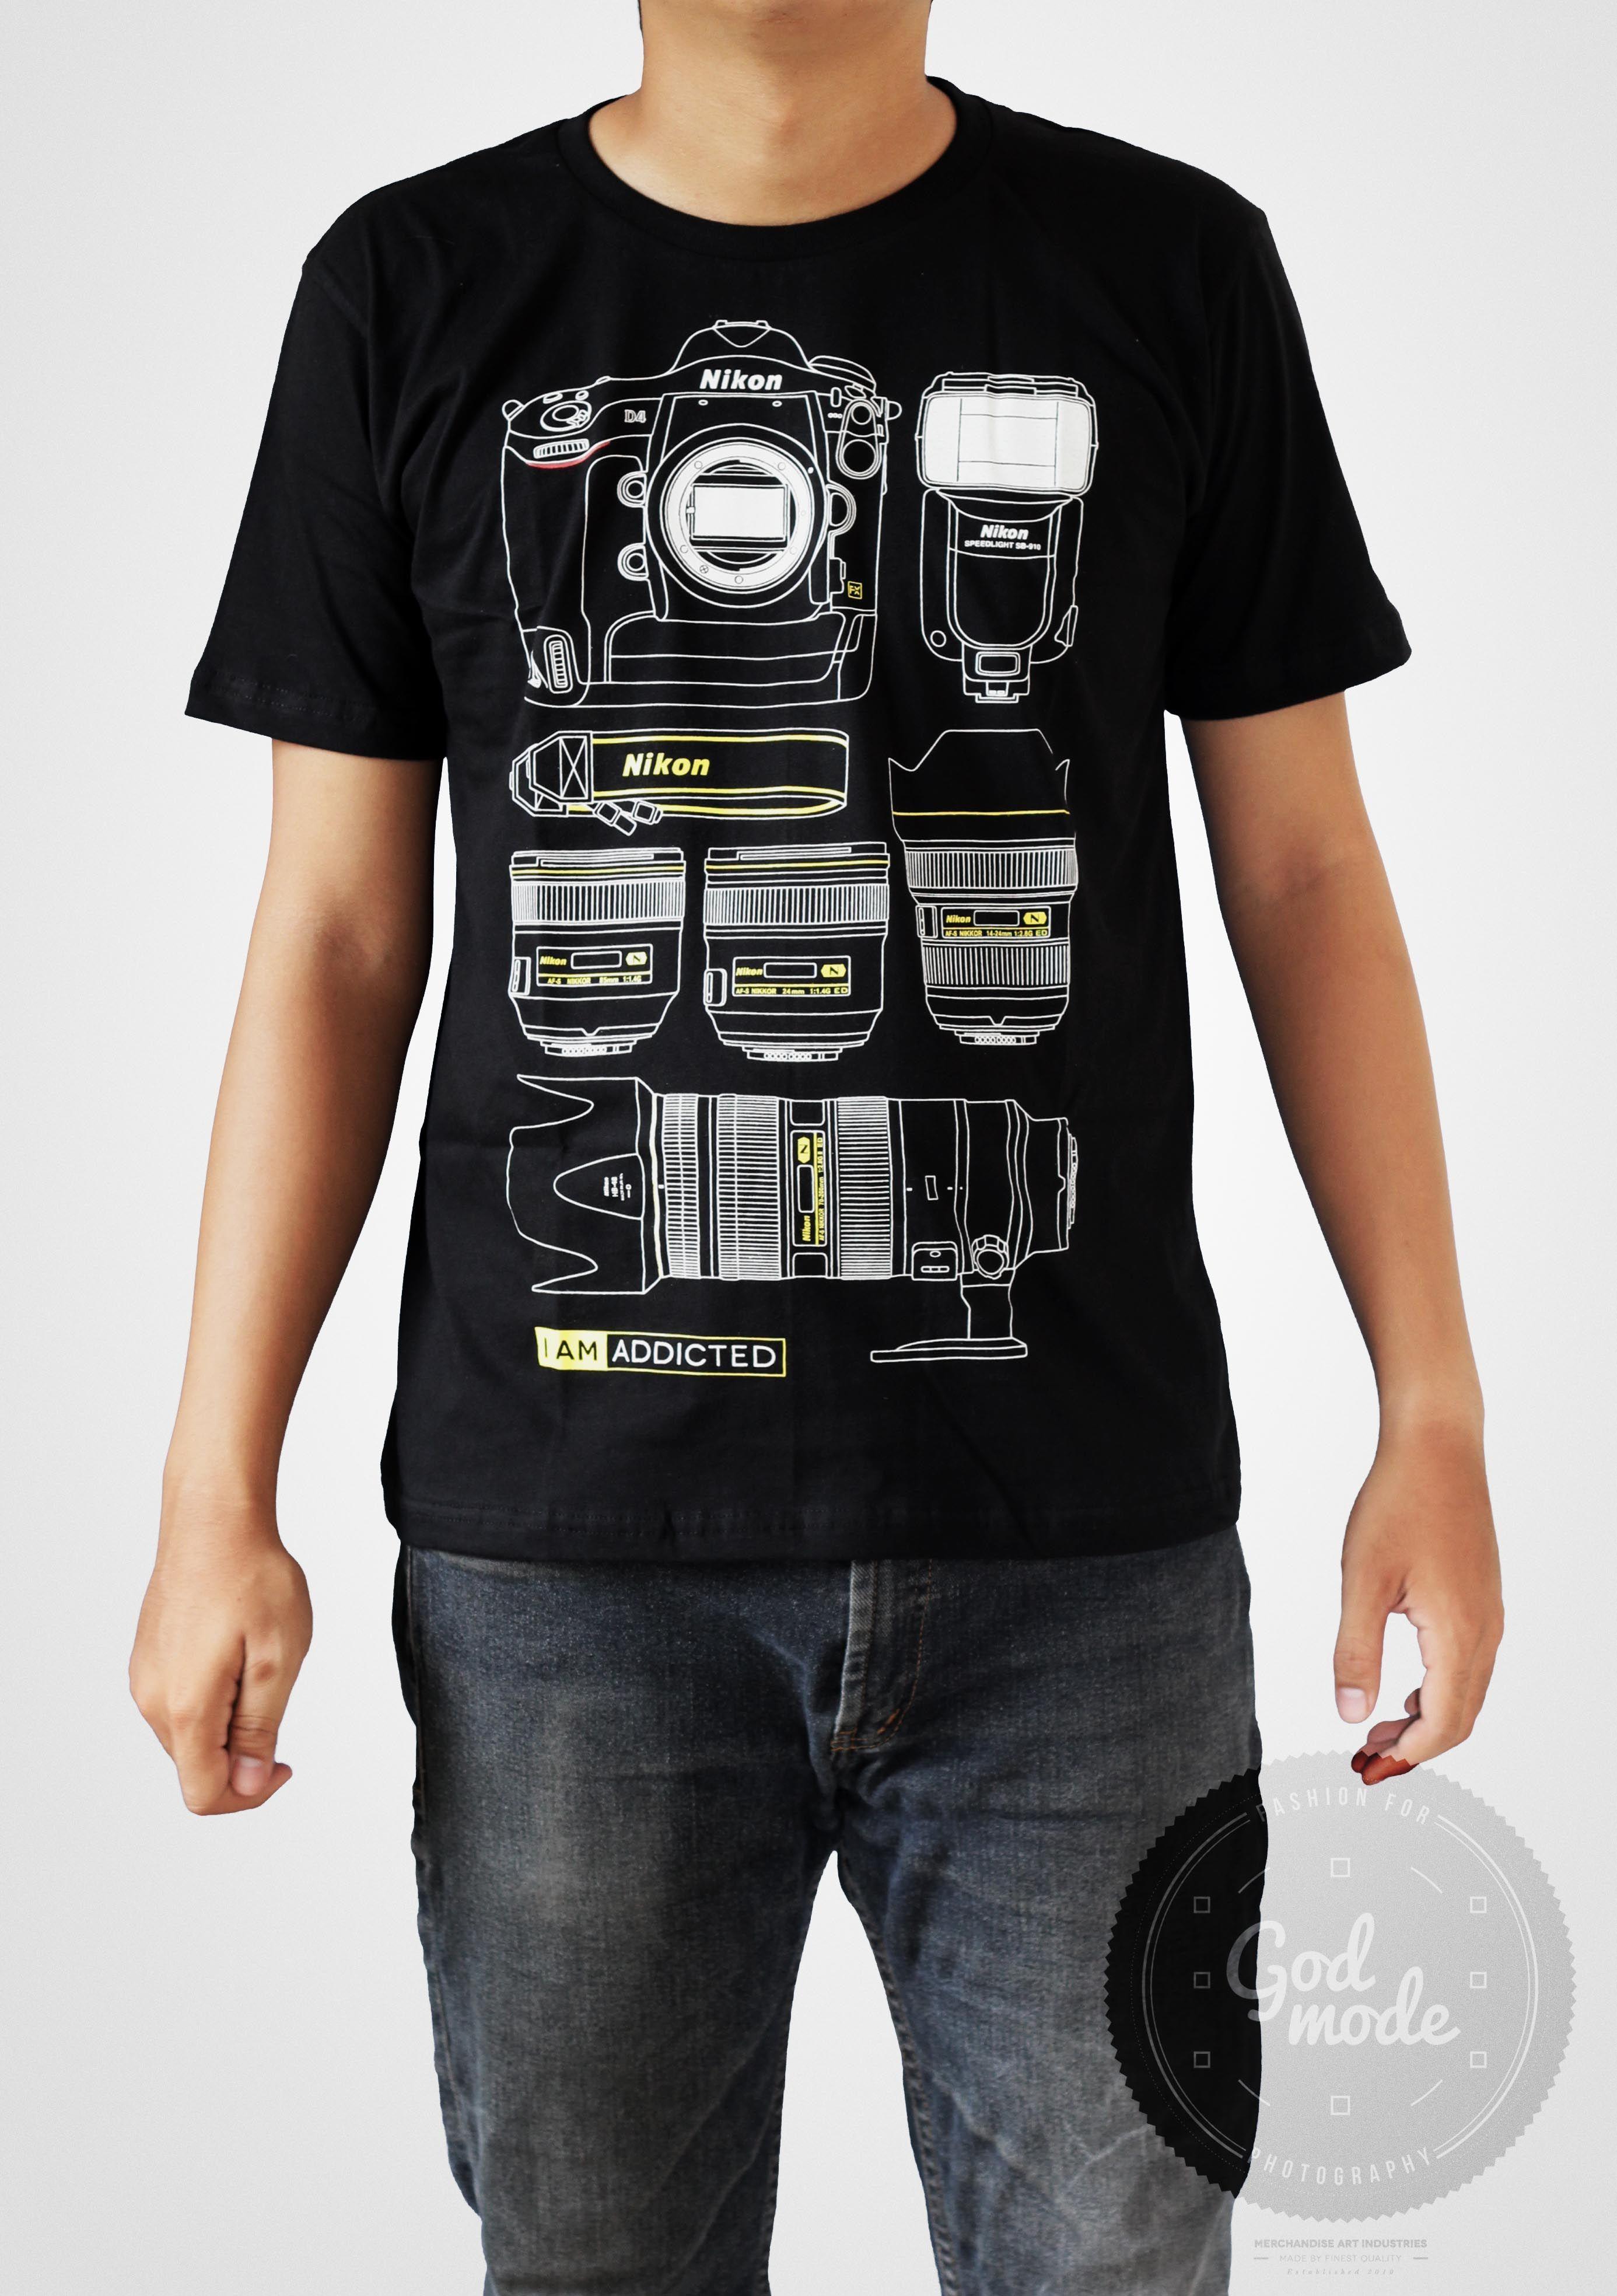 Usd Nikon Equipment T Shirt